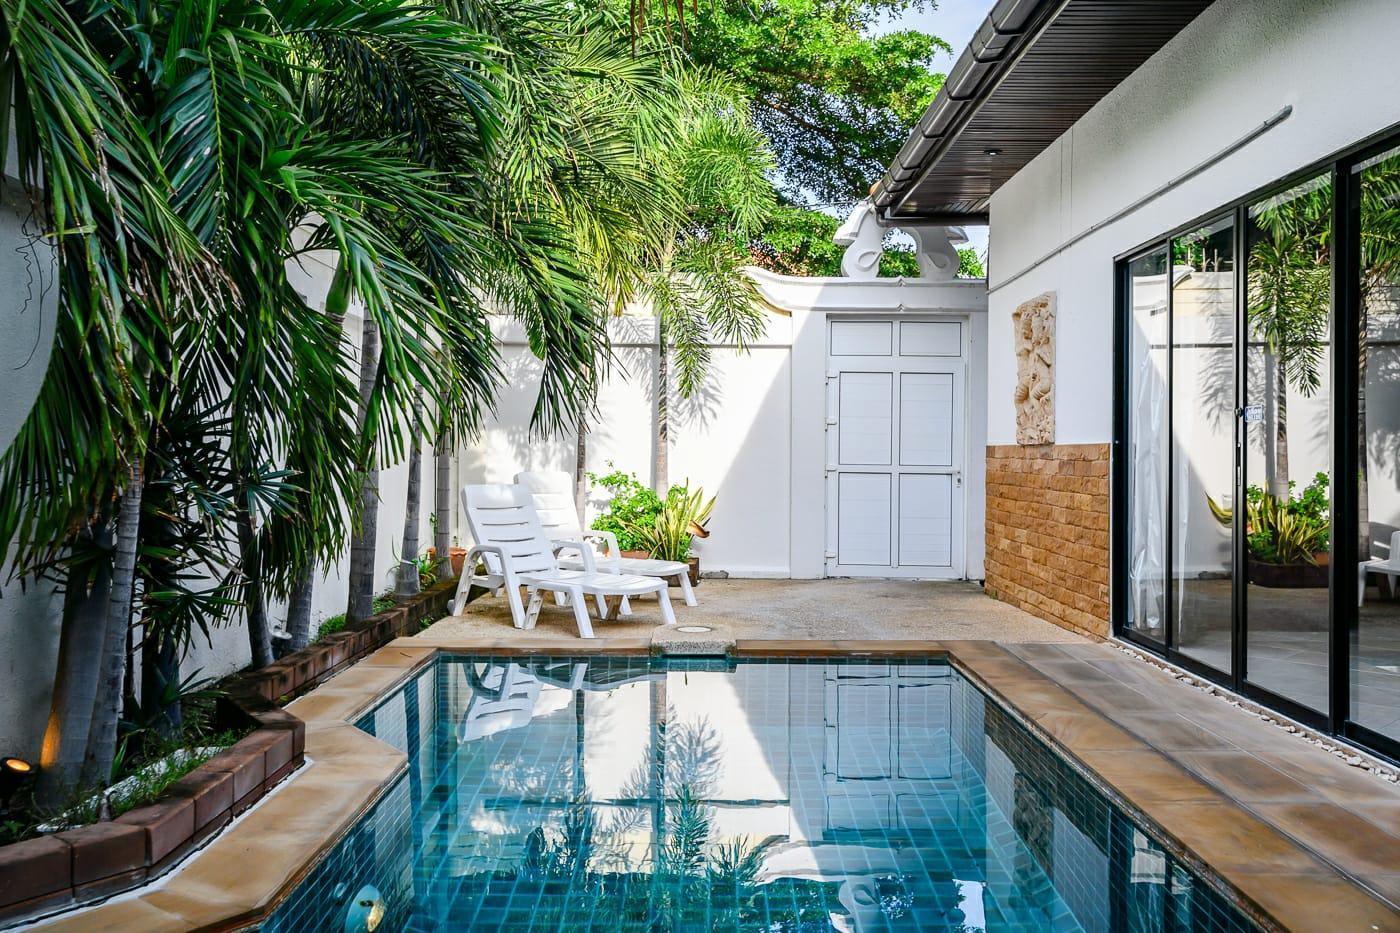 Villa with private pool 300 m away from the beach 2 ห้องนอน 2 ห้องน้ำส่วนตัว ขนาด 100 ตร.ม. – เขาพระตำหนัก